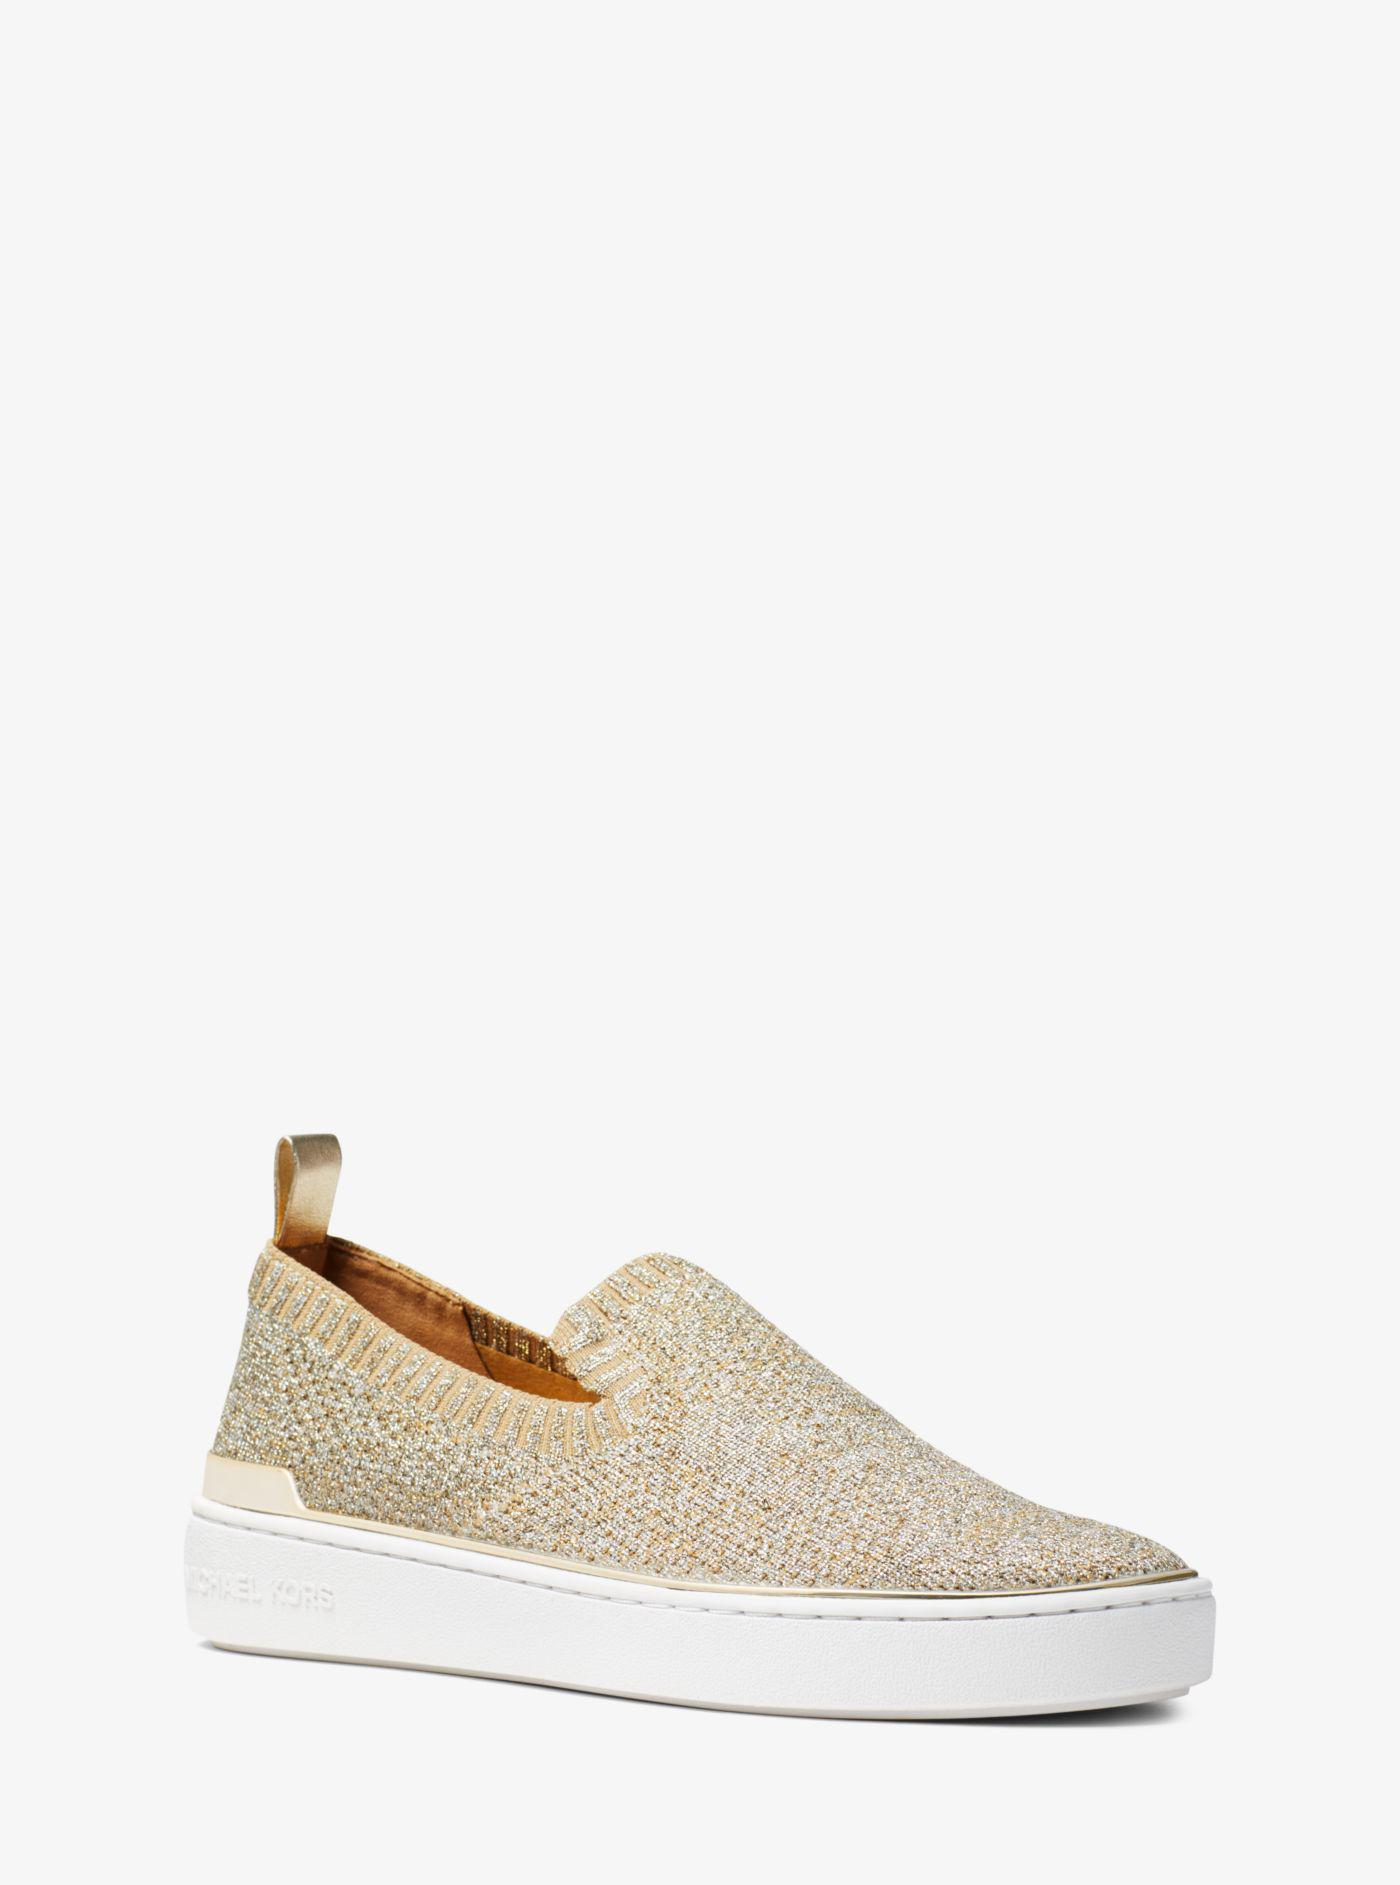 938e8dae892f Michael Kors Michael Skyler Slip-on Sneakers in Metallic - Save ...